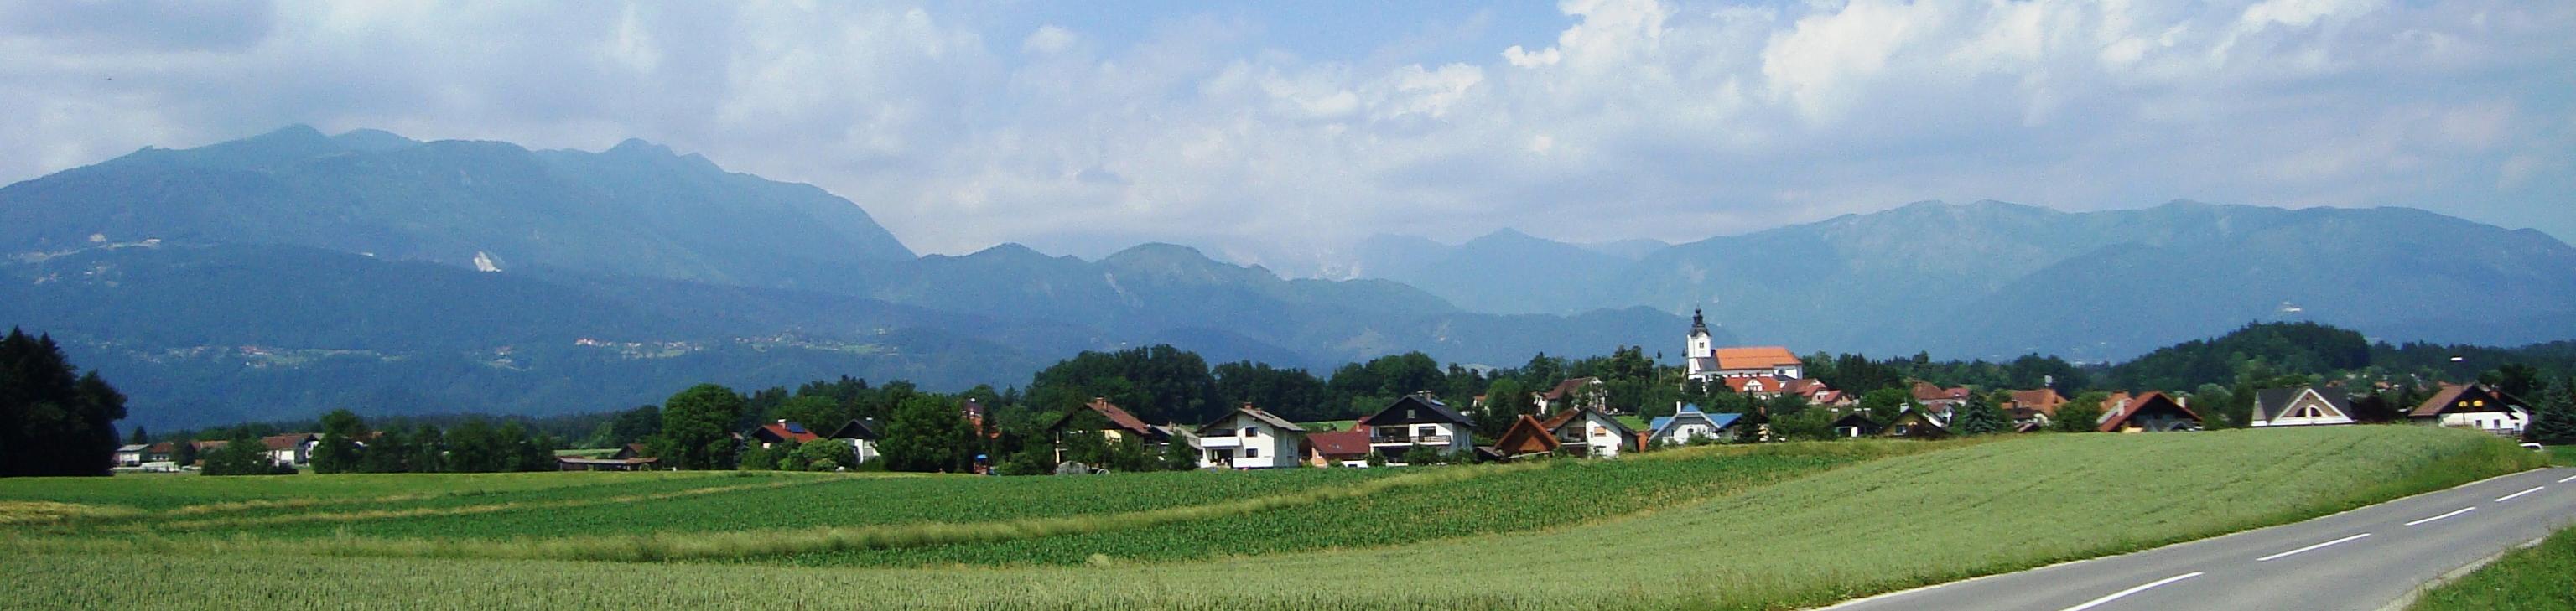 Planinsko društvo Komenda